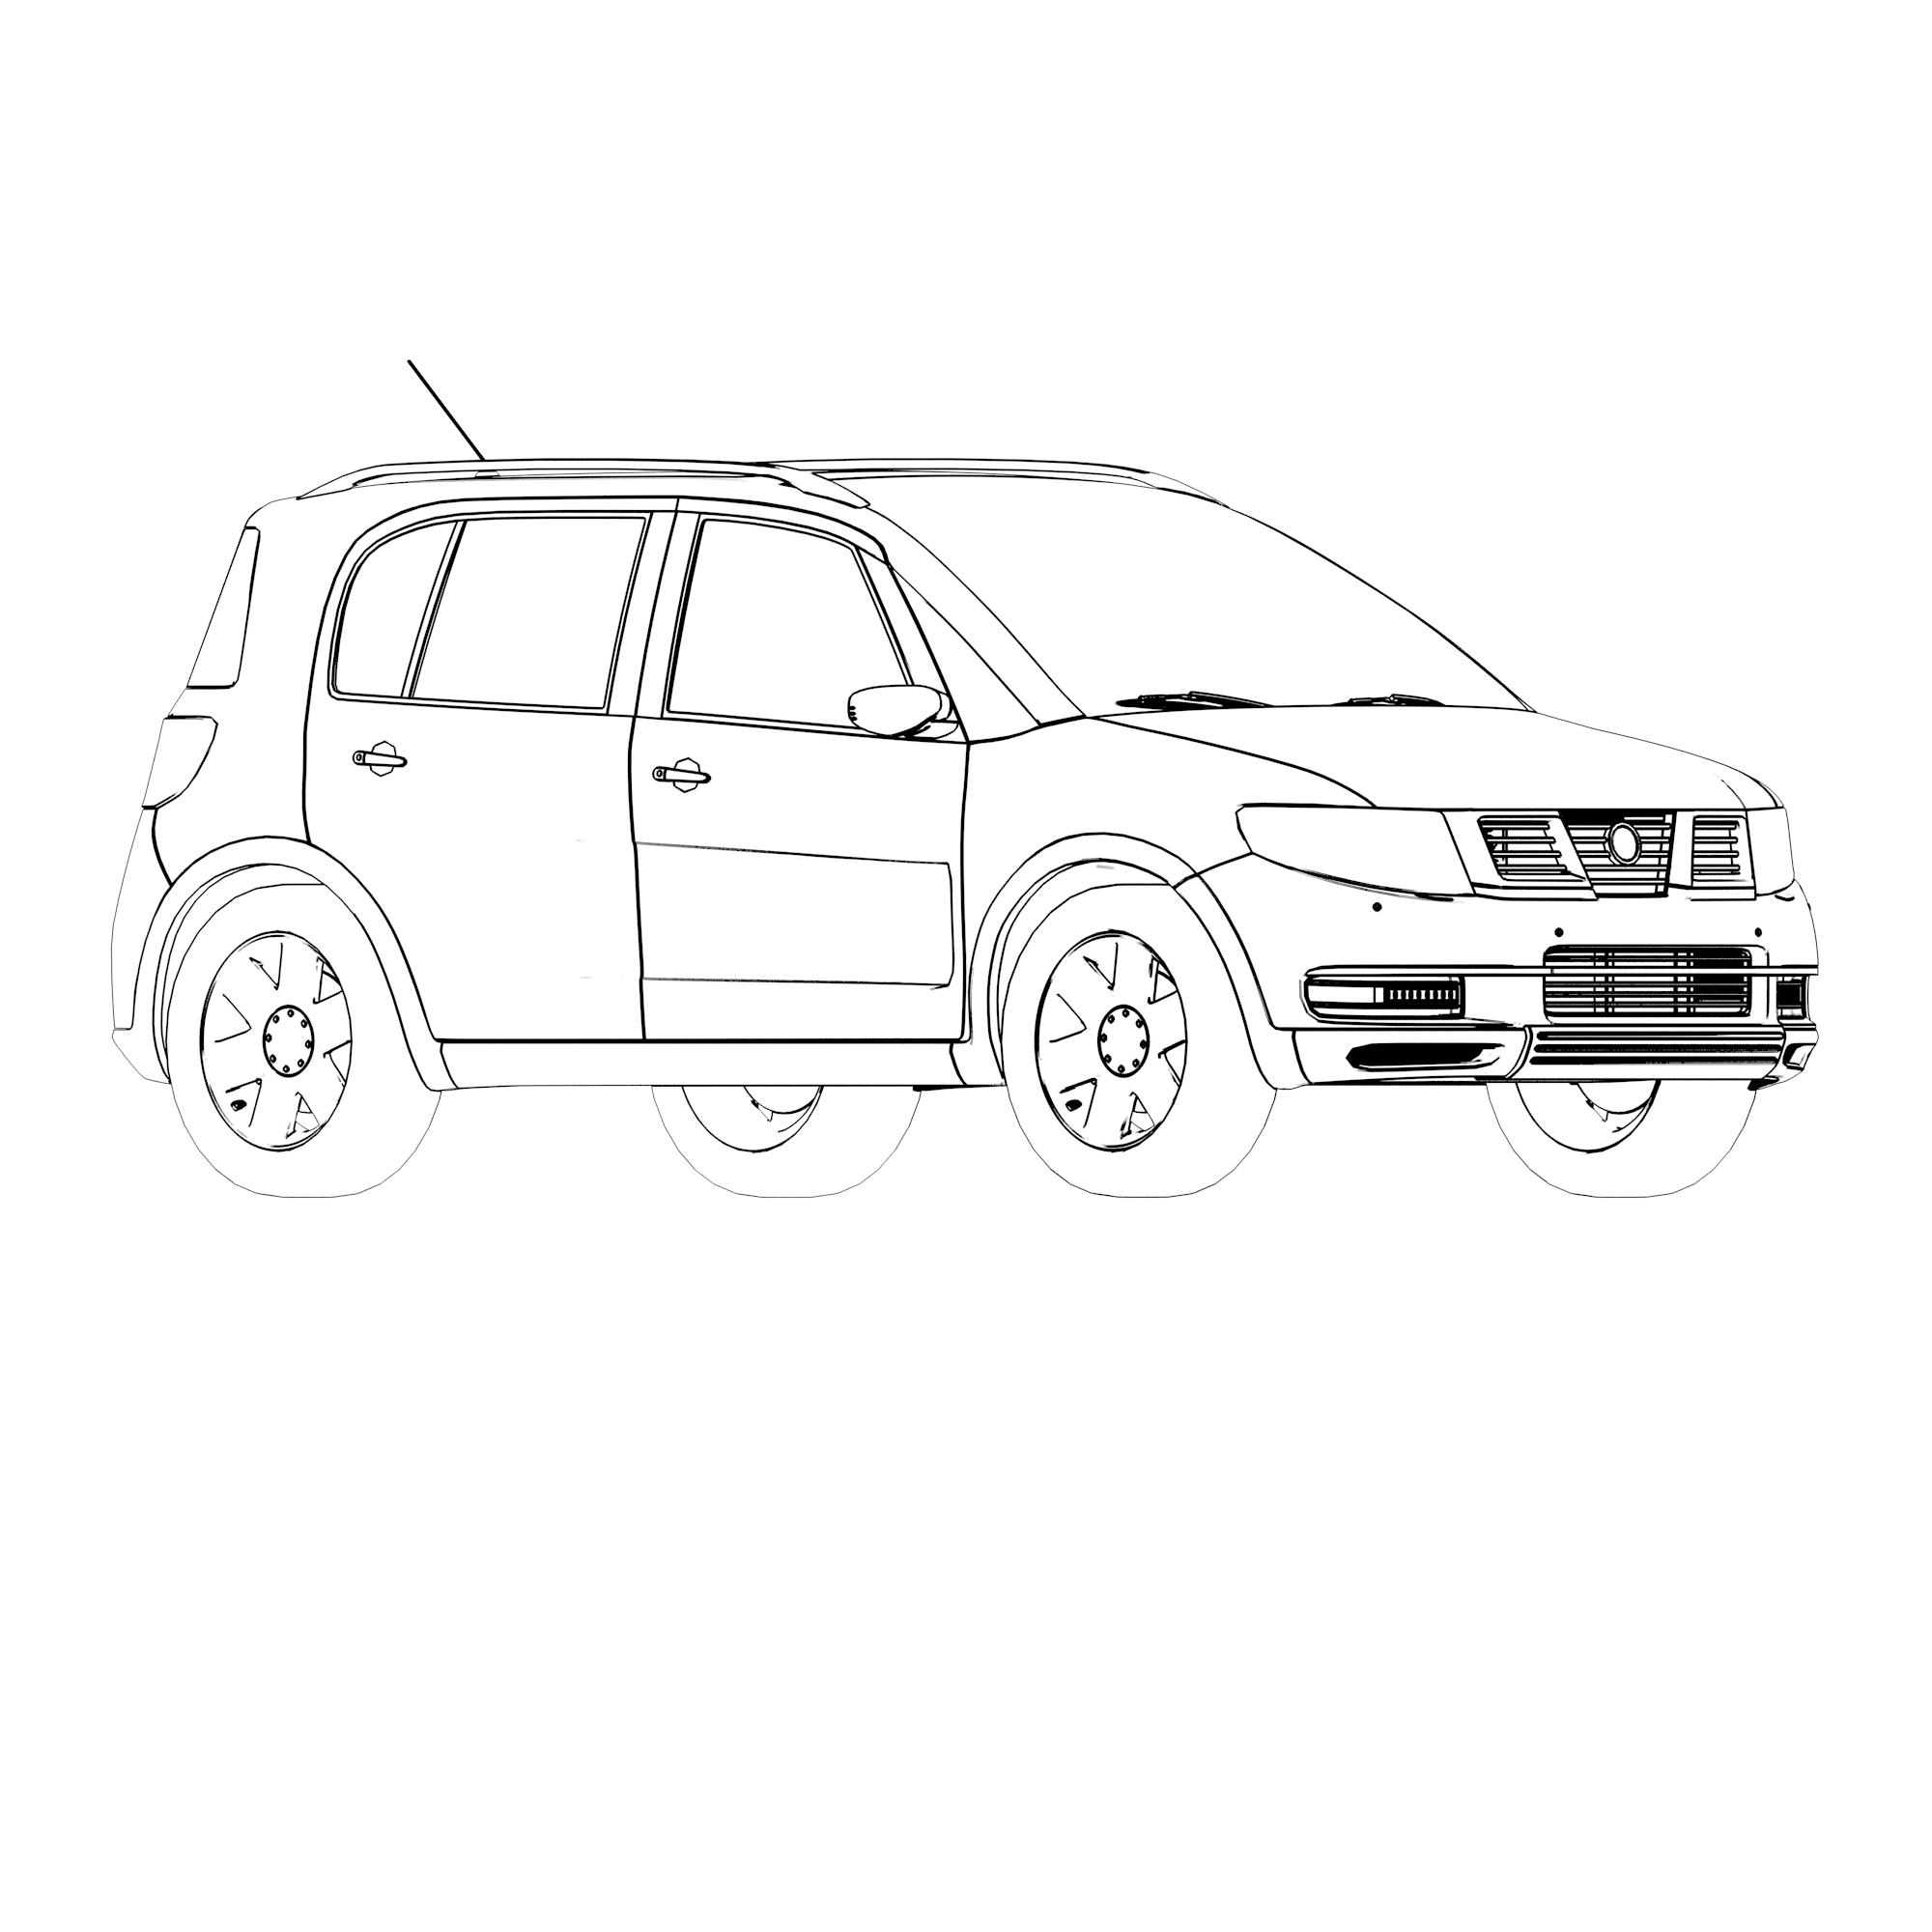 MSI_SUV_front_11-12_v1.png